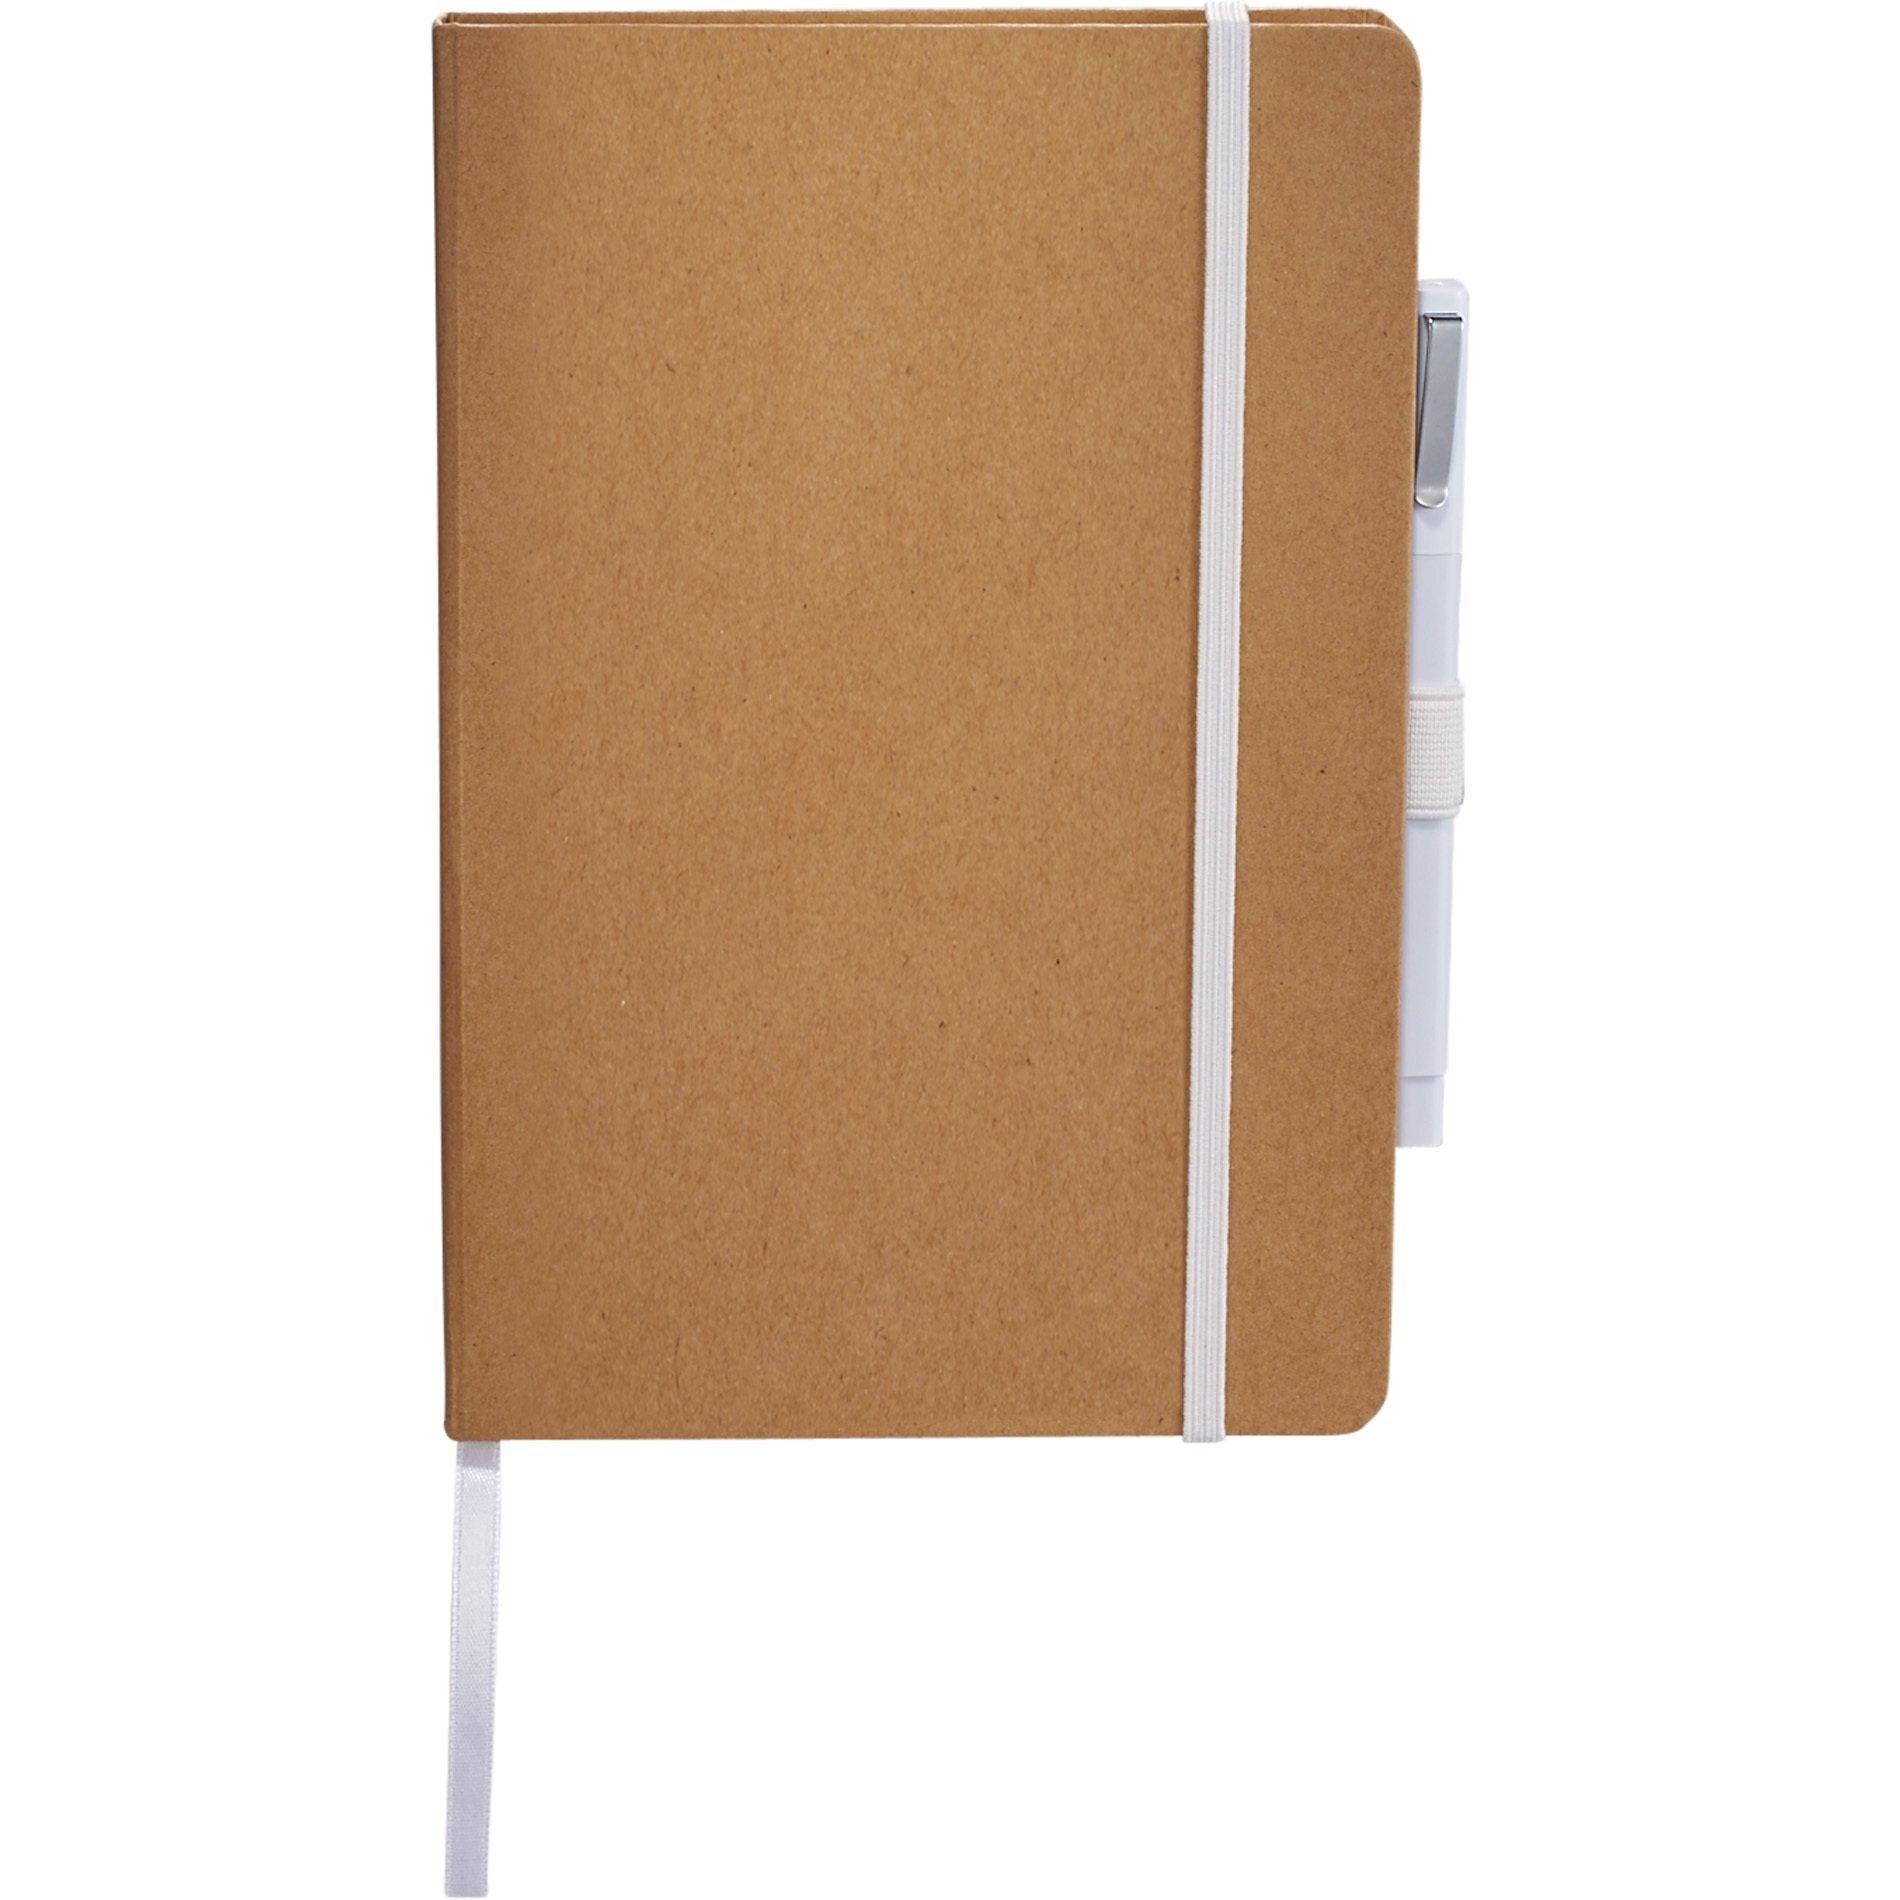 Eco Color Bound JournalBook™ & Pen Gift Set